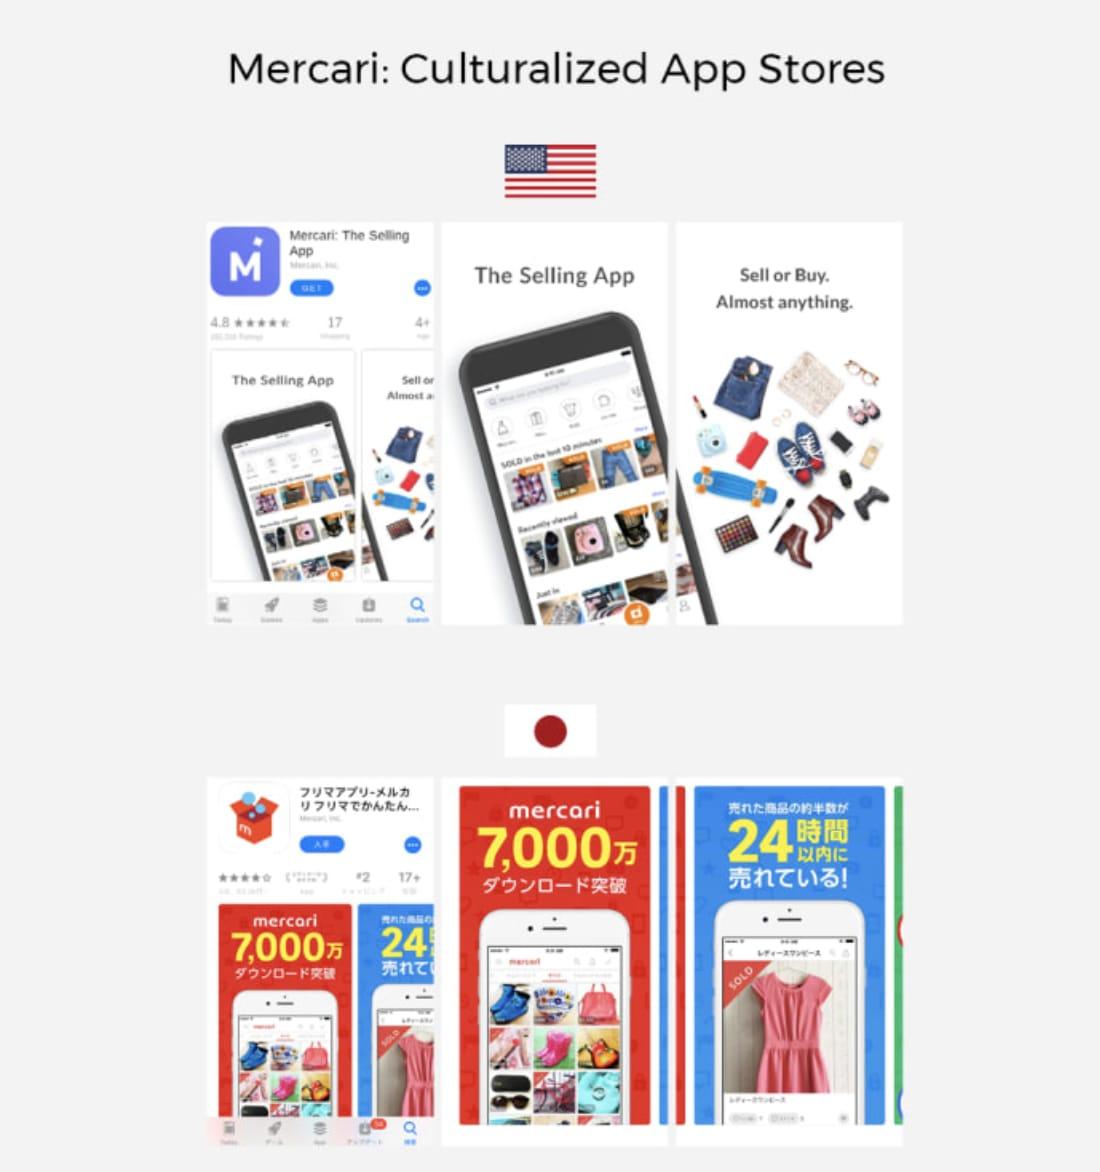 Mercari: Culturalized App Stores